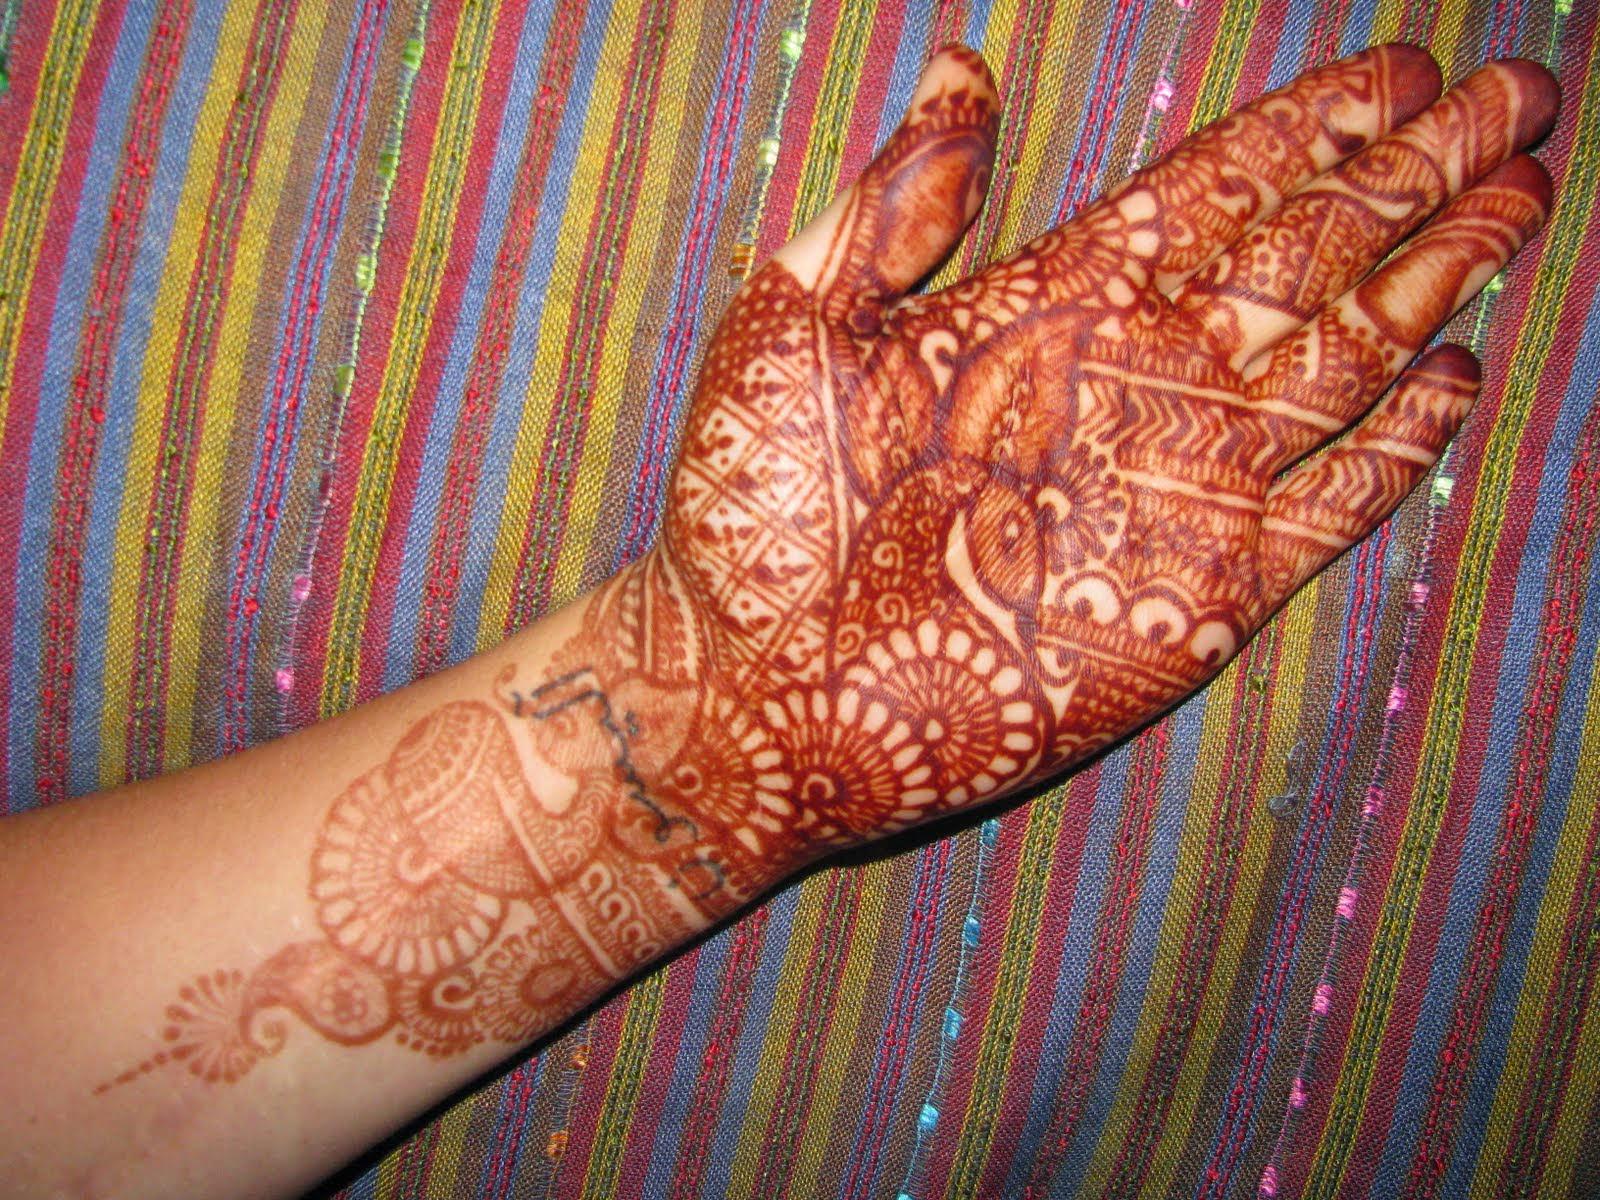 Henna Tattoos on Hands